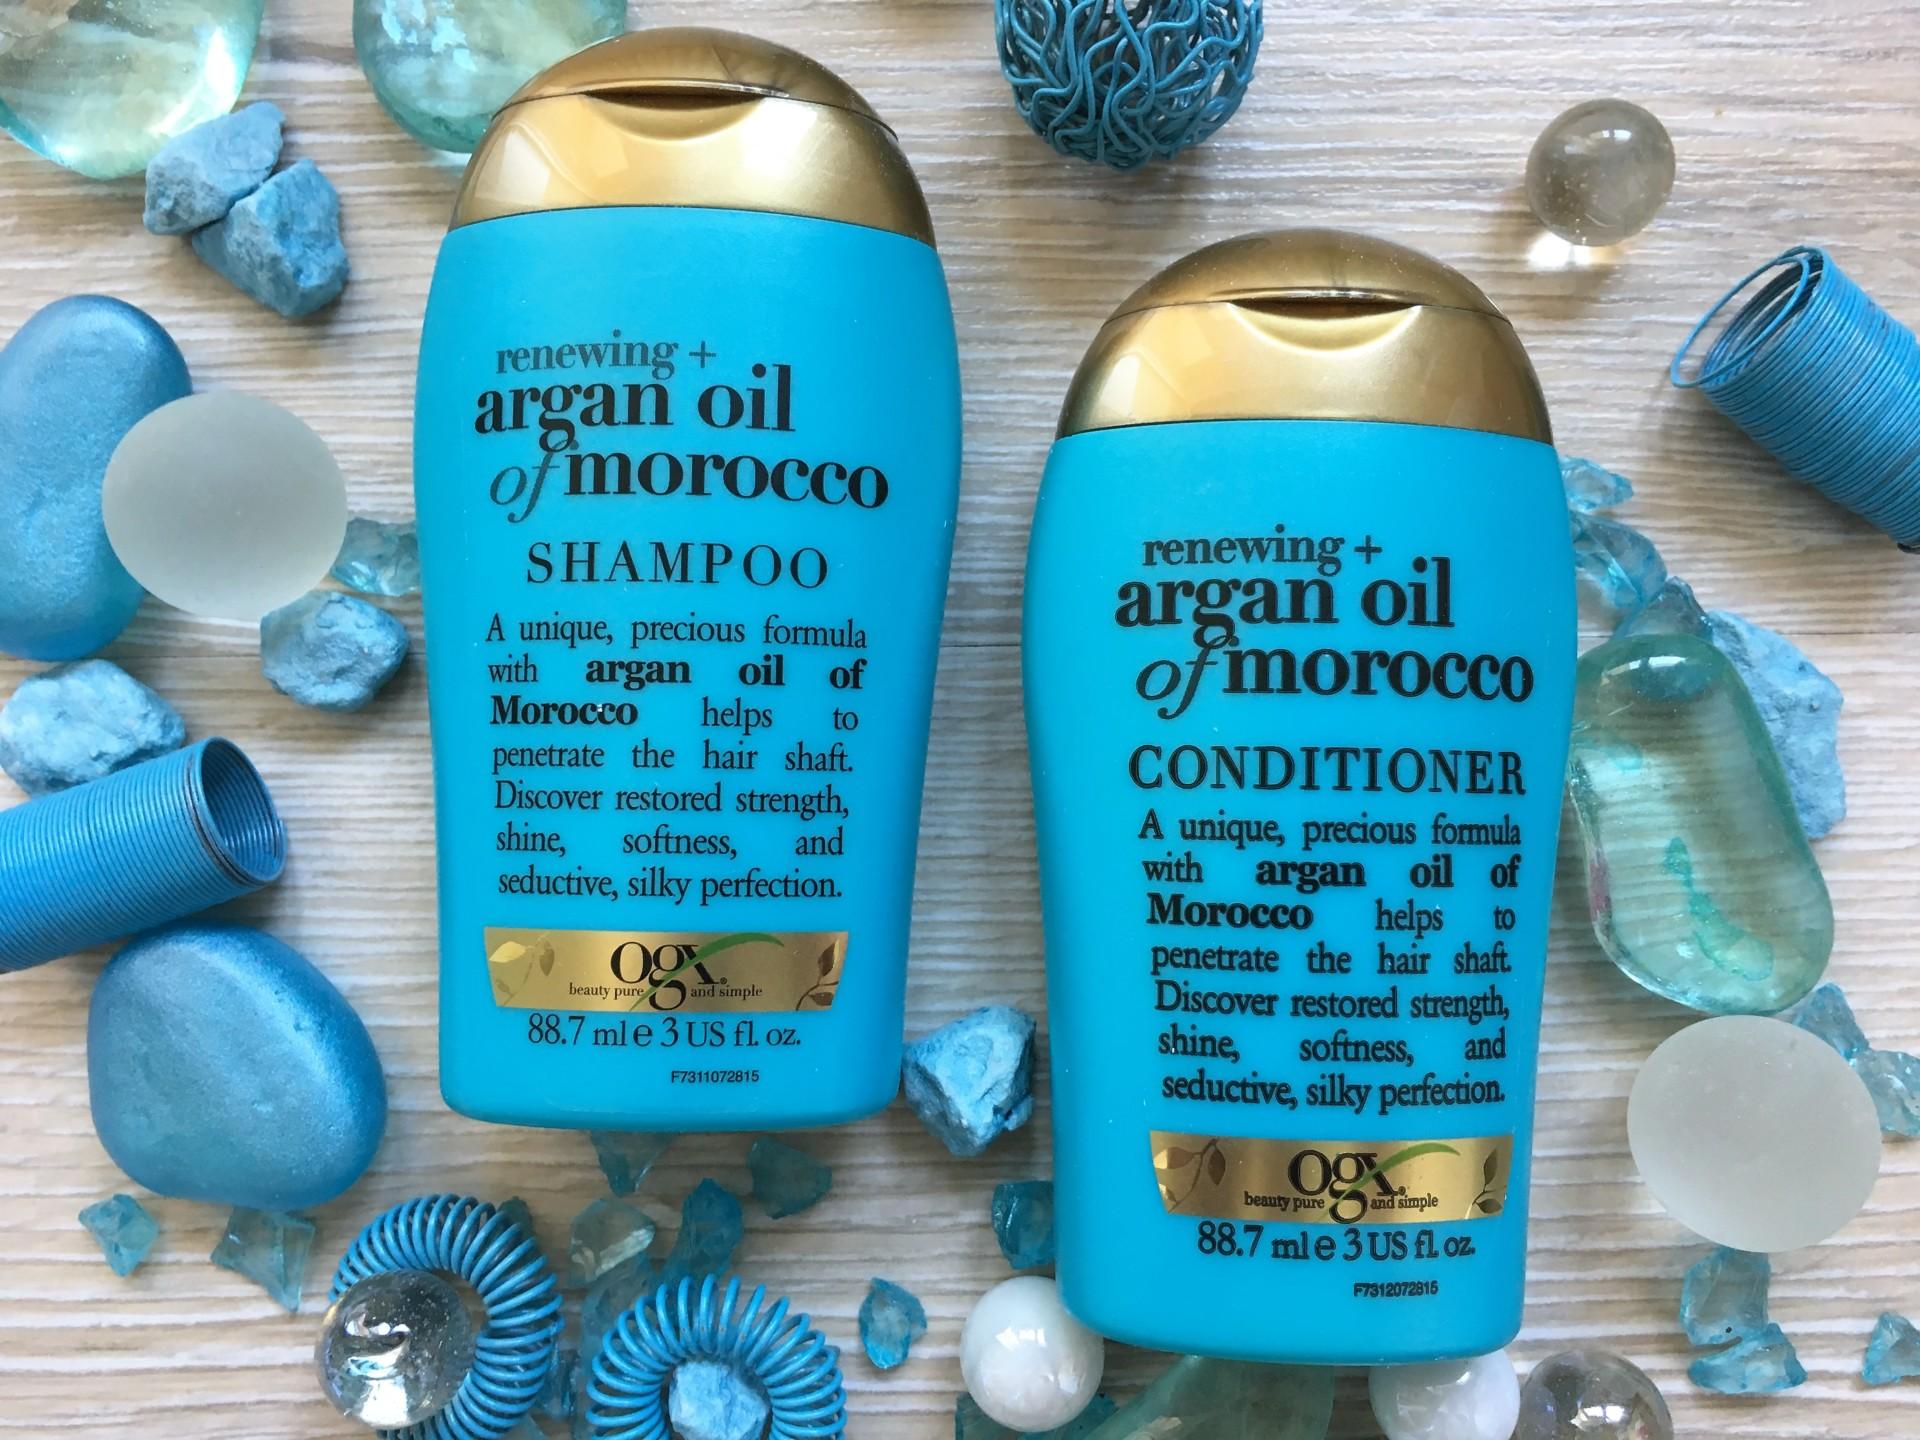 InStyle_box_beauty_box_dbkstylez_makeup_ogx_bestblog_renewing_argan_oil_of_morocco_бьюти_бокс_инстайл